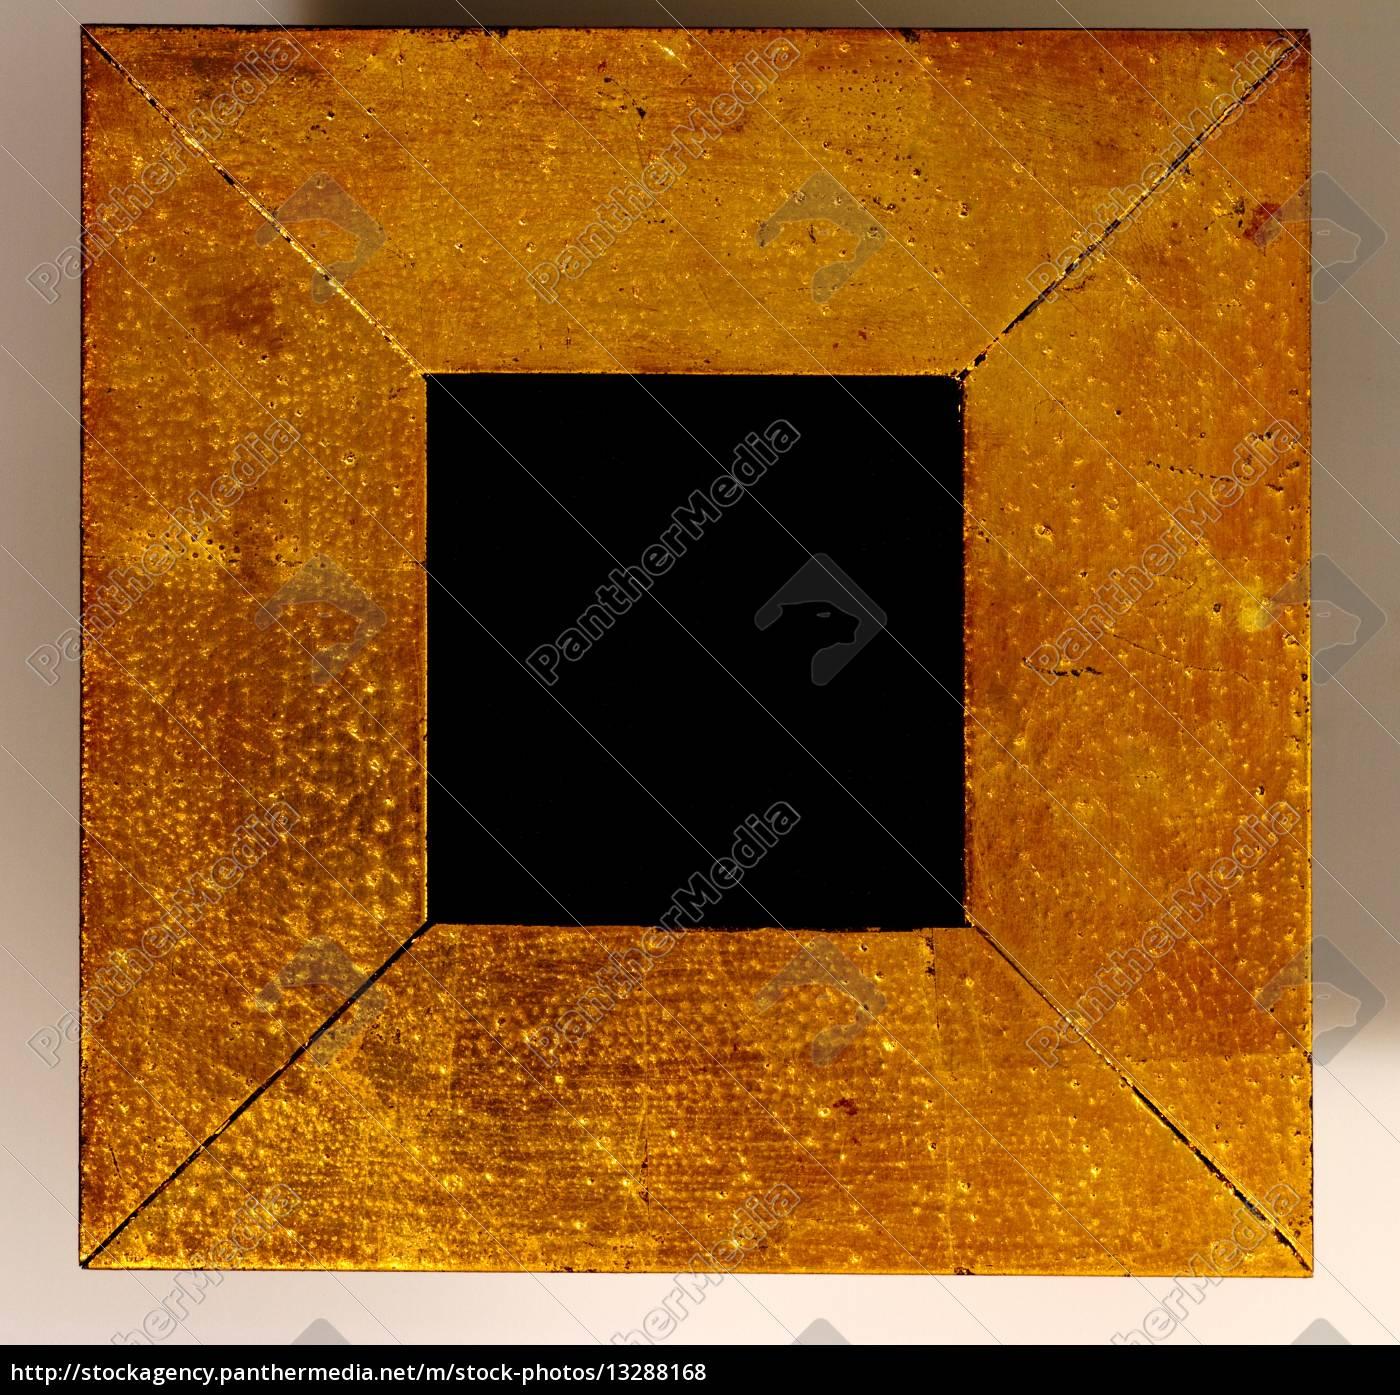 farbe gold struktur form rahmen fett punkte dick - Lizenzfreies Foto ...